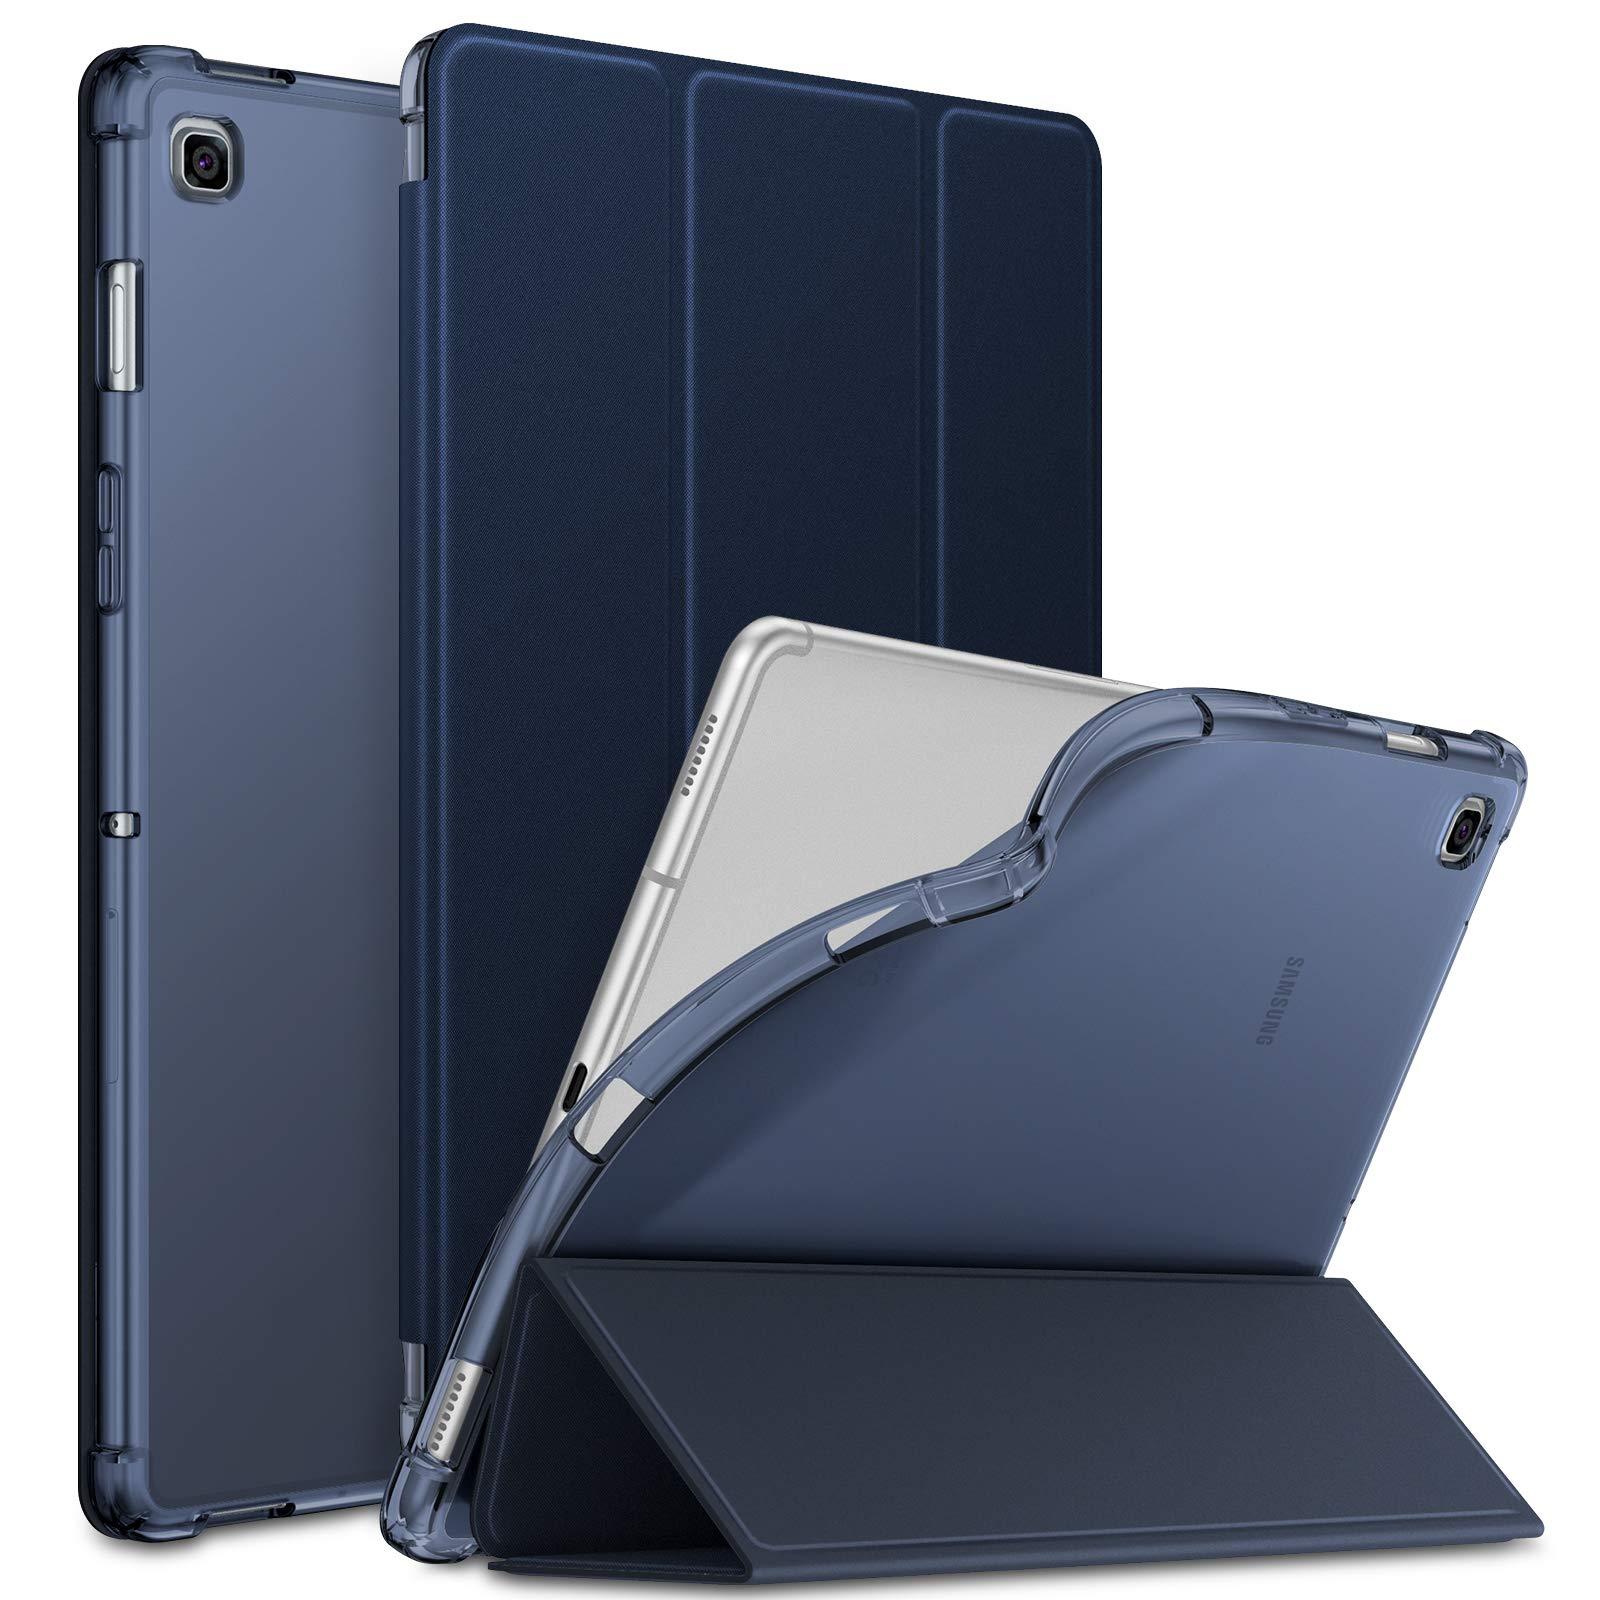 Funda Samsung Galaxy Tab S5e Infiland [7s8g1m3f]